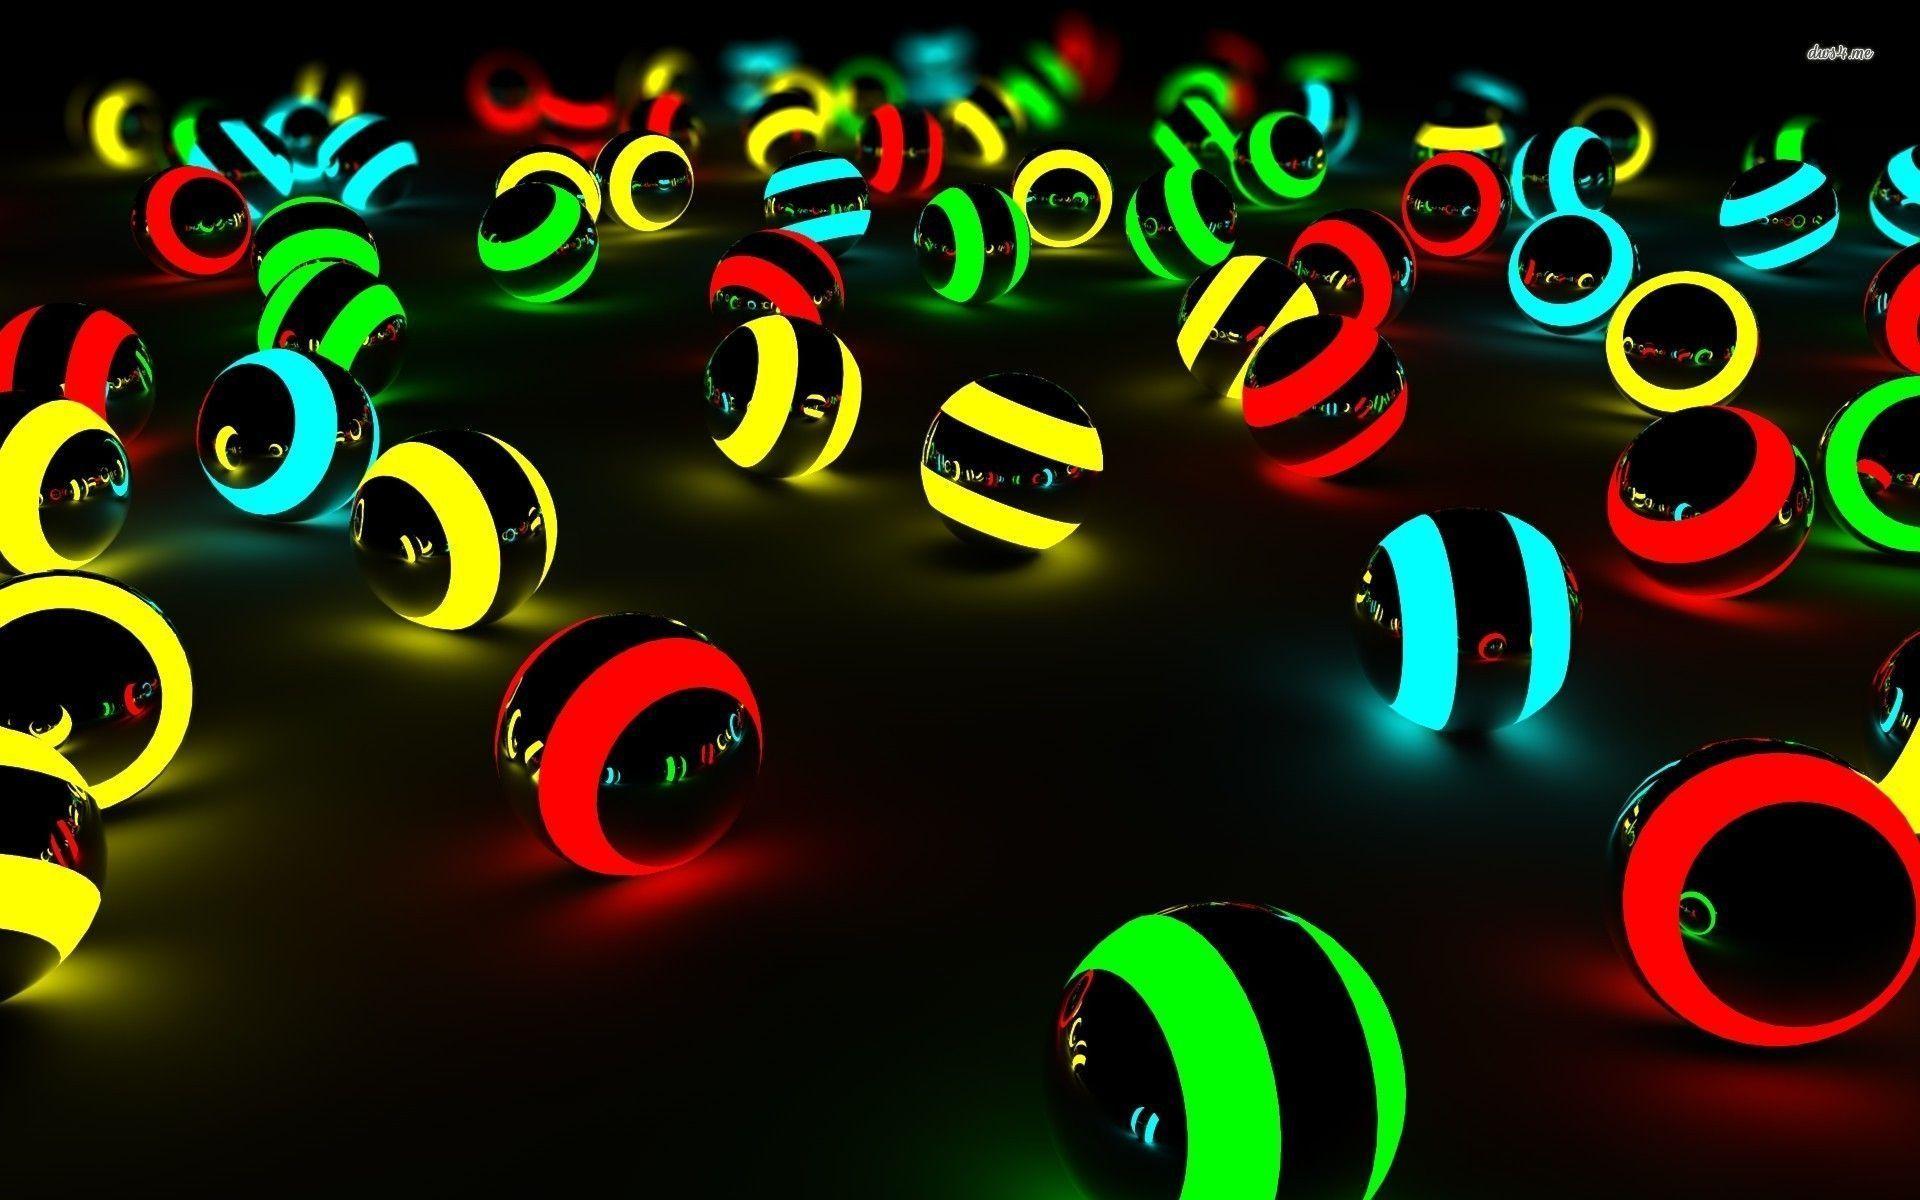 Neon Wallpapers Hd Resolution For Desktop Wallpaper Hd